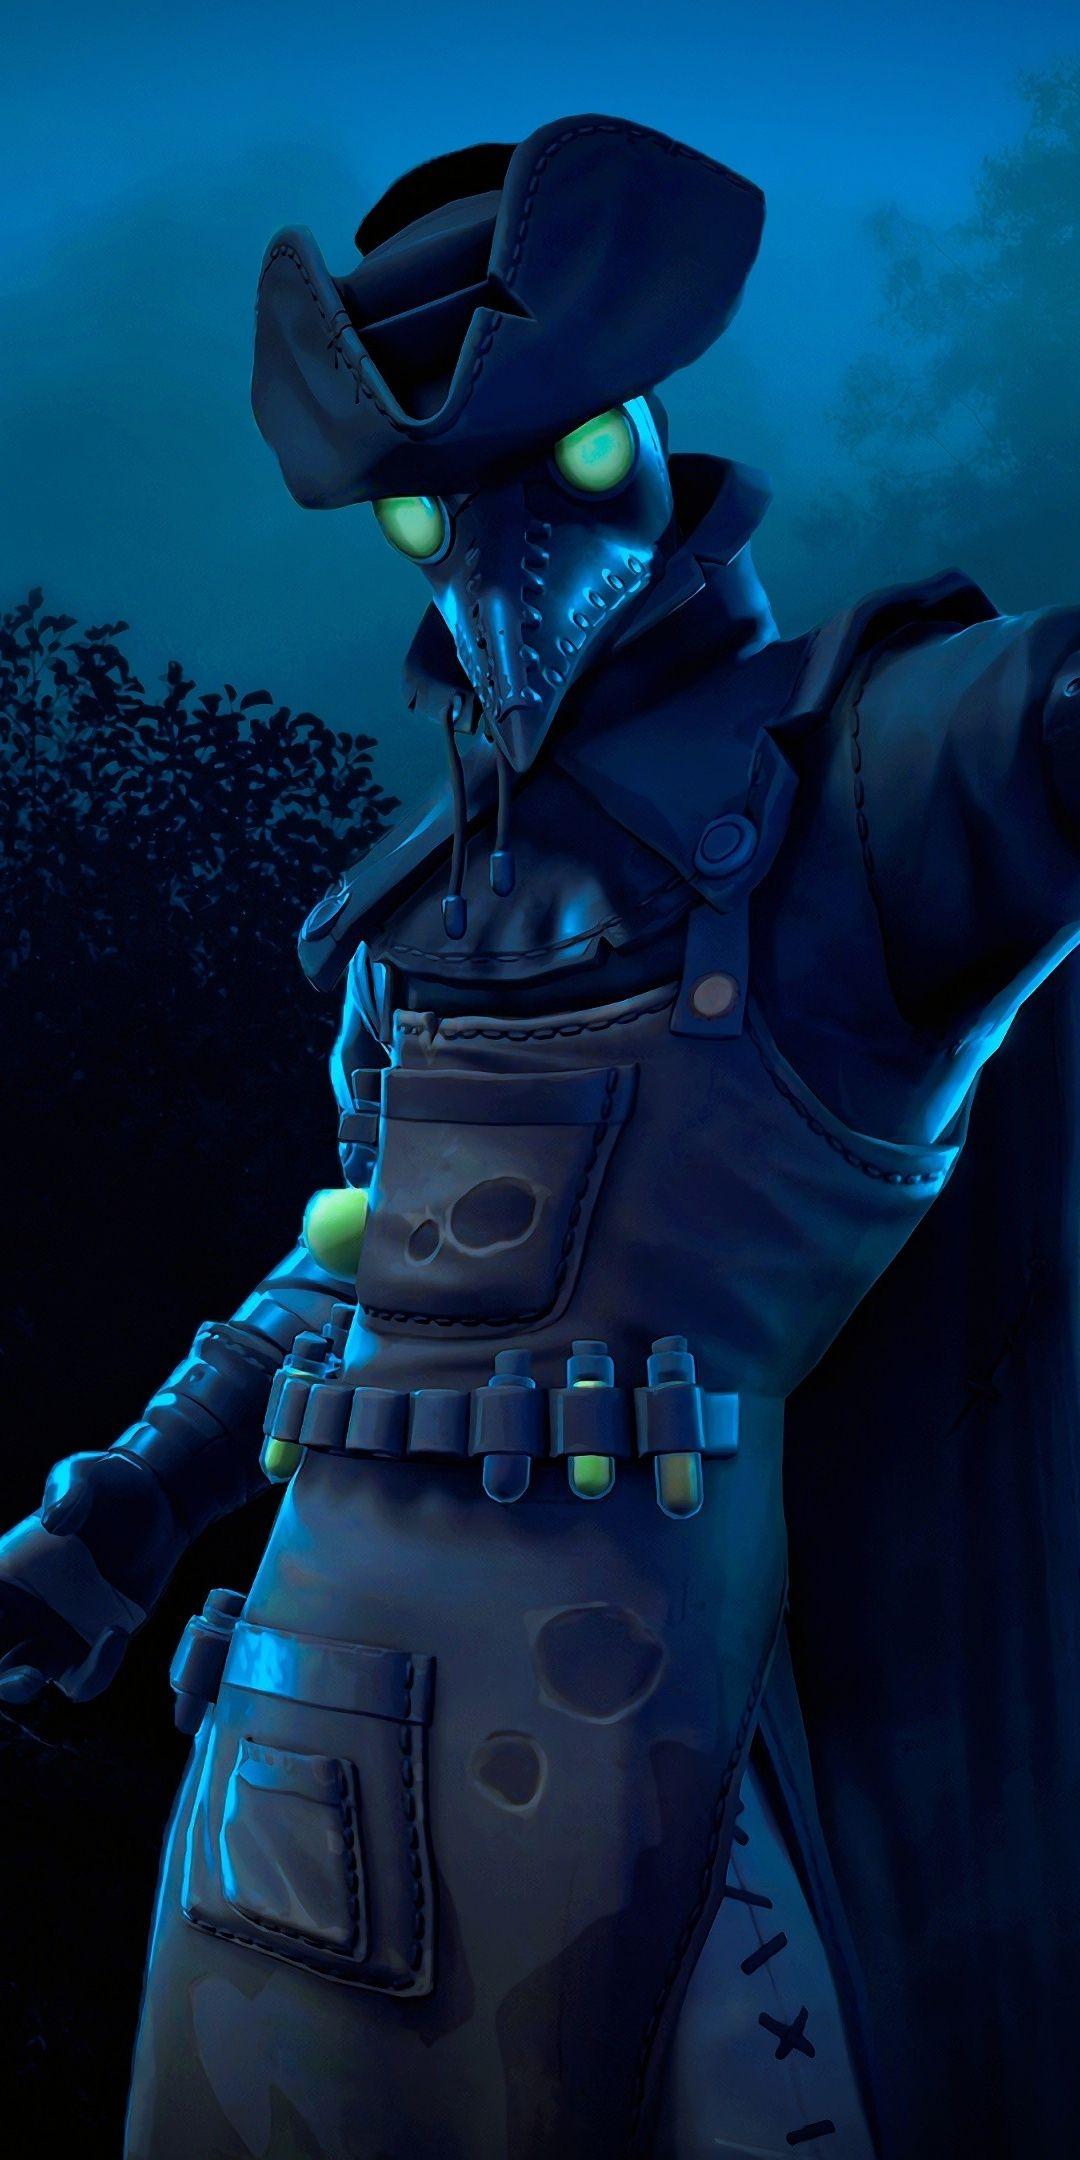 Plague, Fortnite, video game, season 6, 2018, 1080x2160